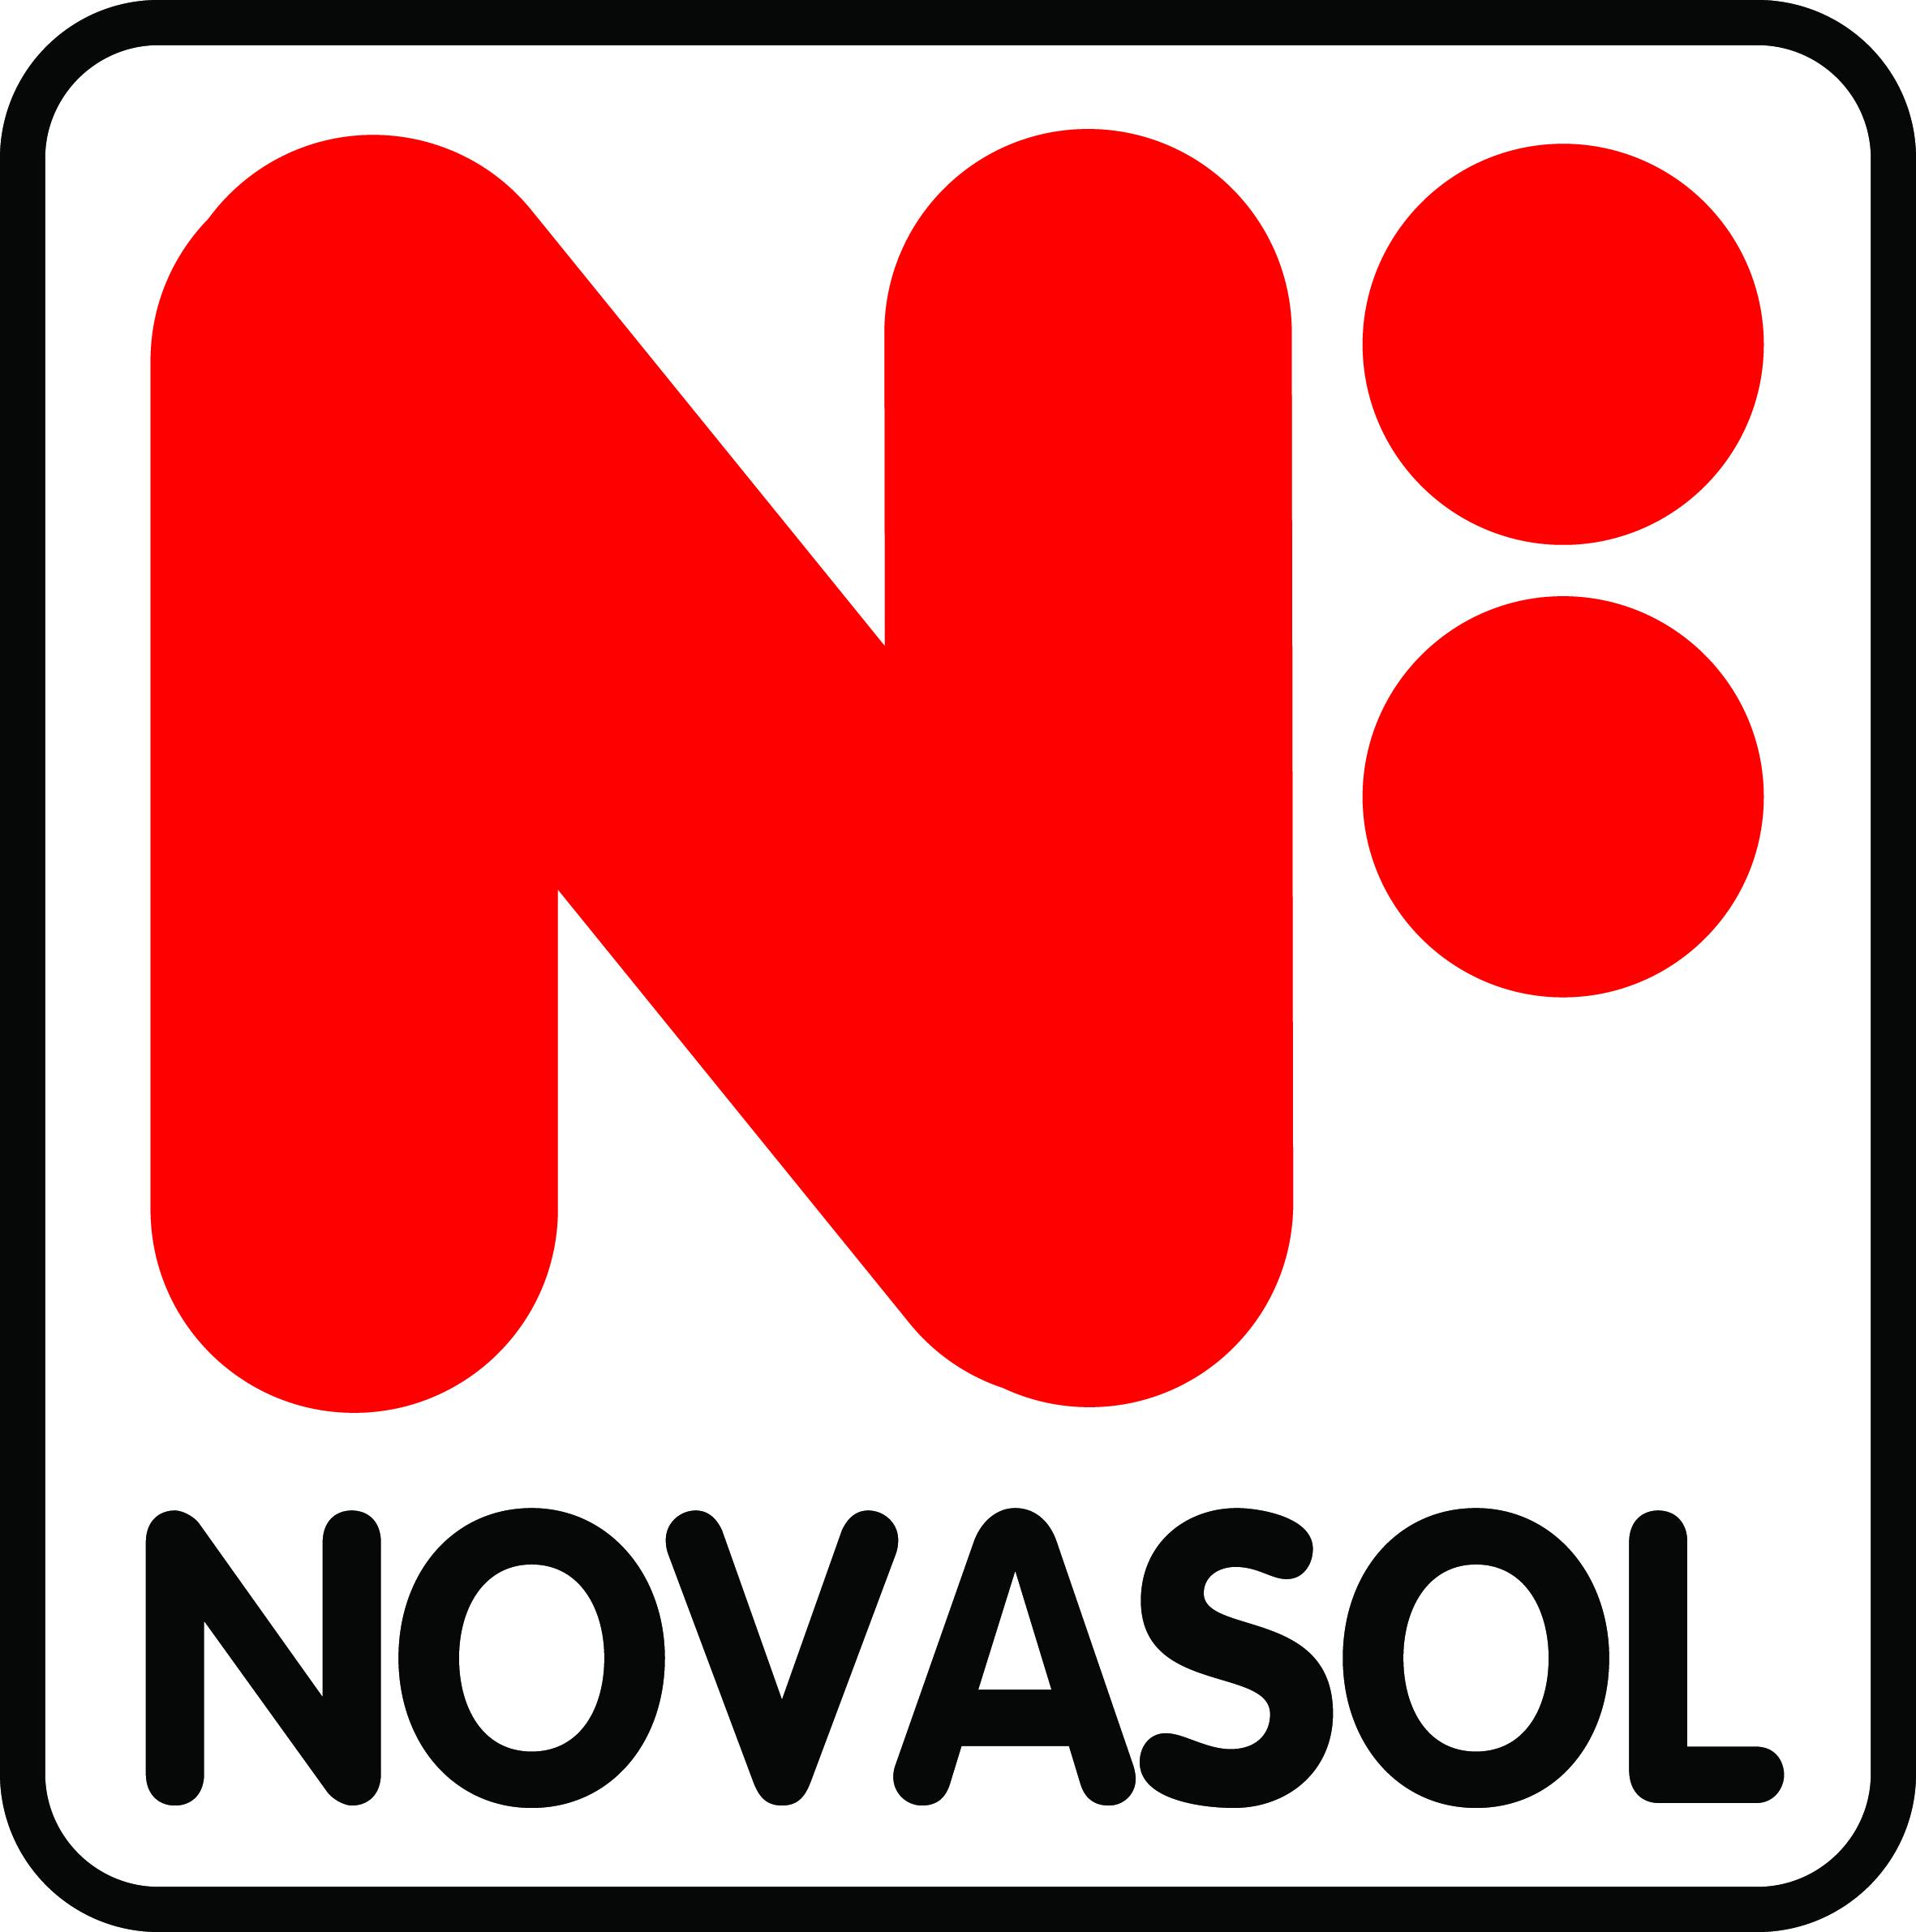 Novasol Lille